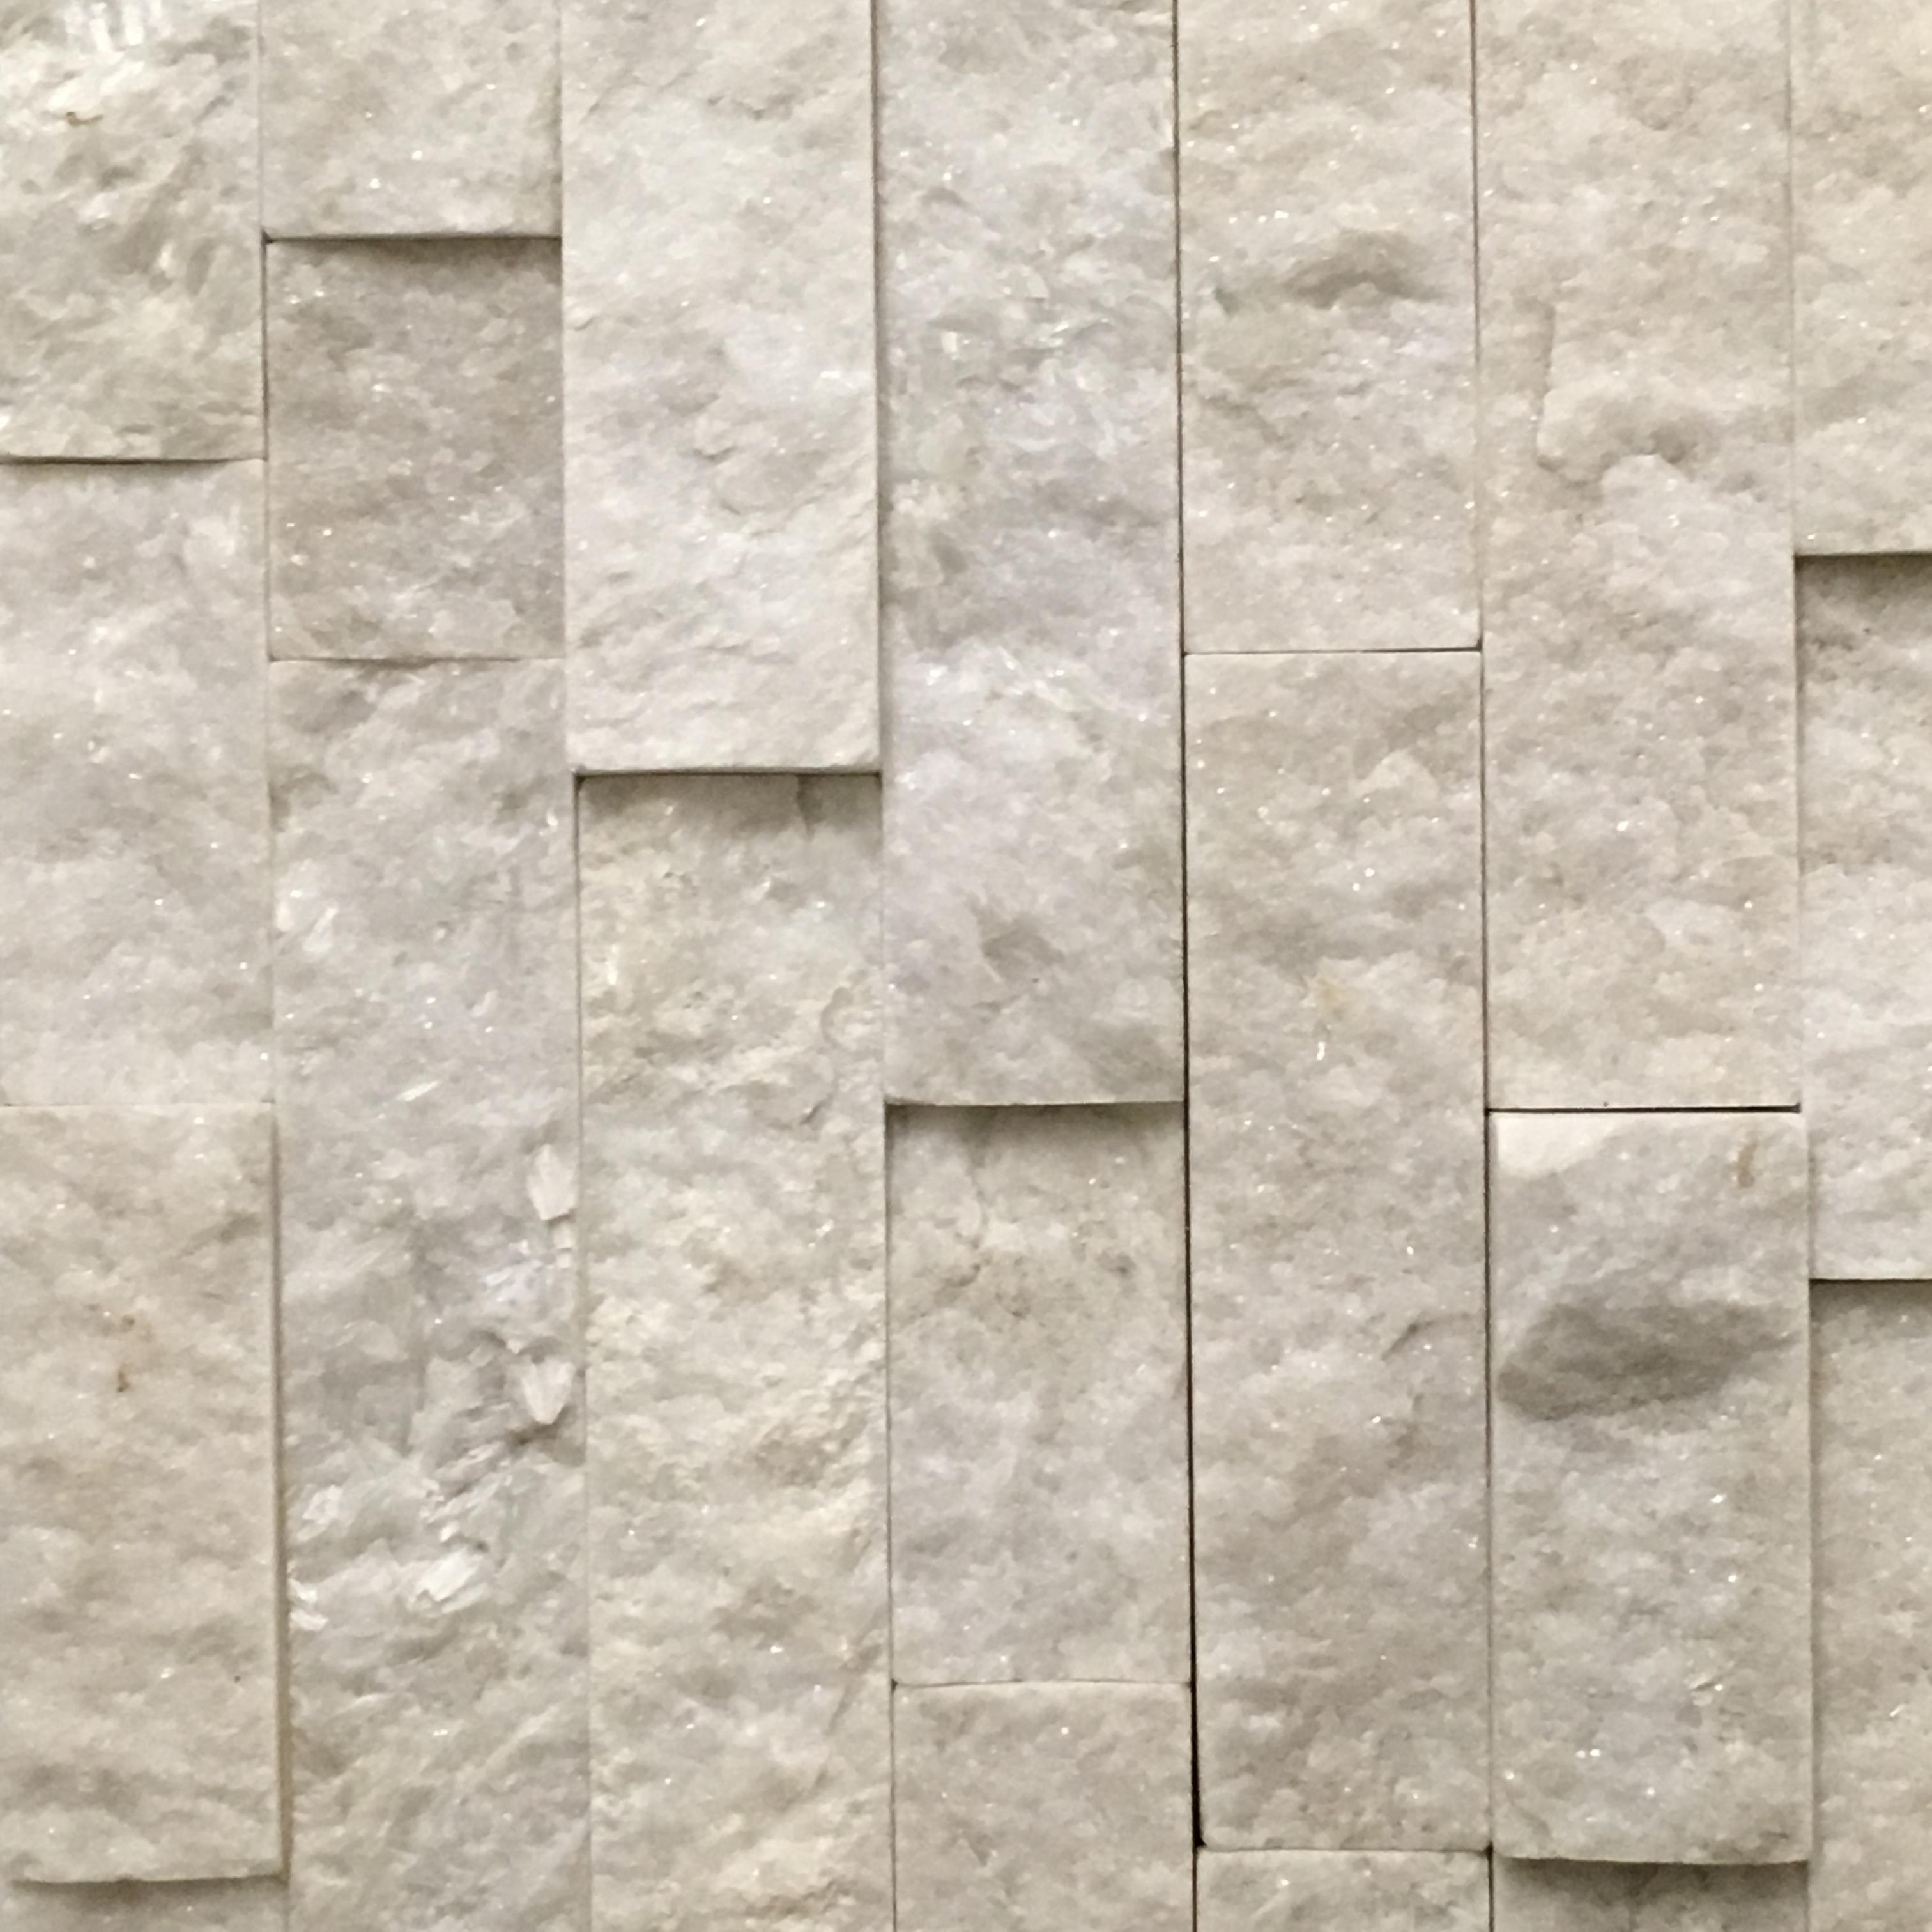 Products - Tile & Stone Techniques